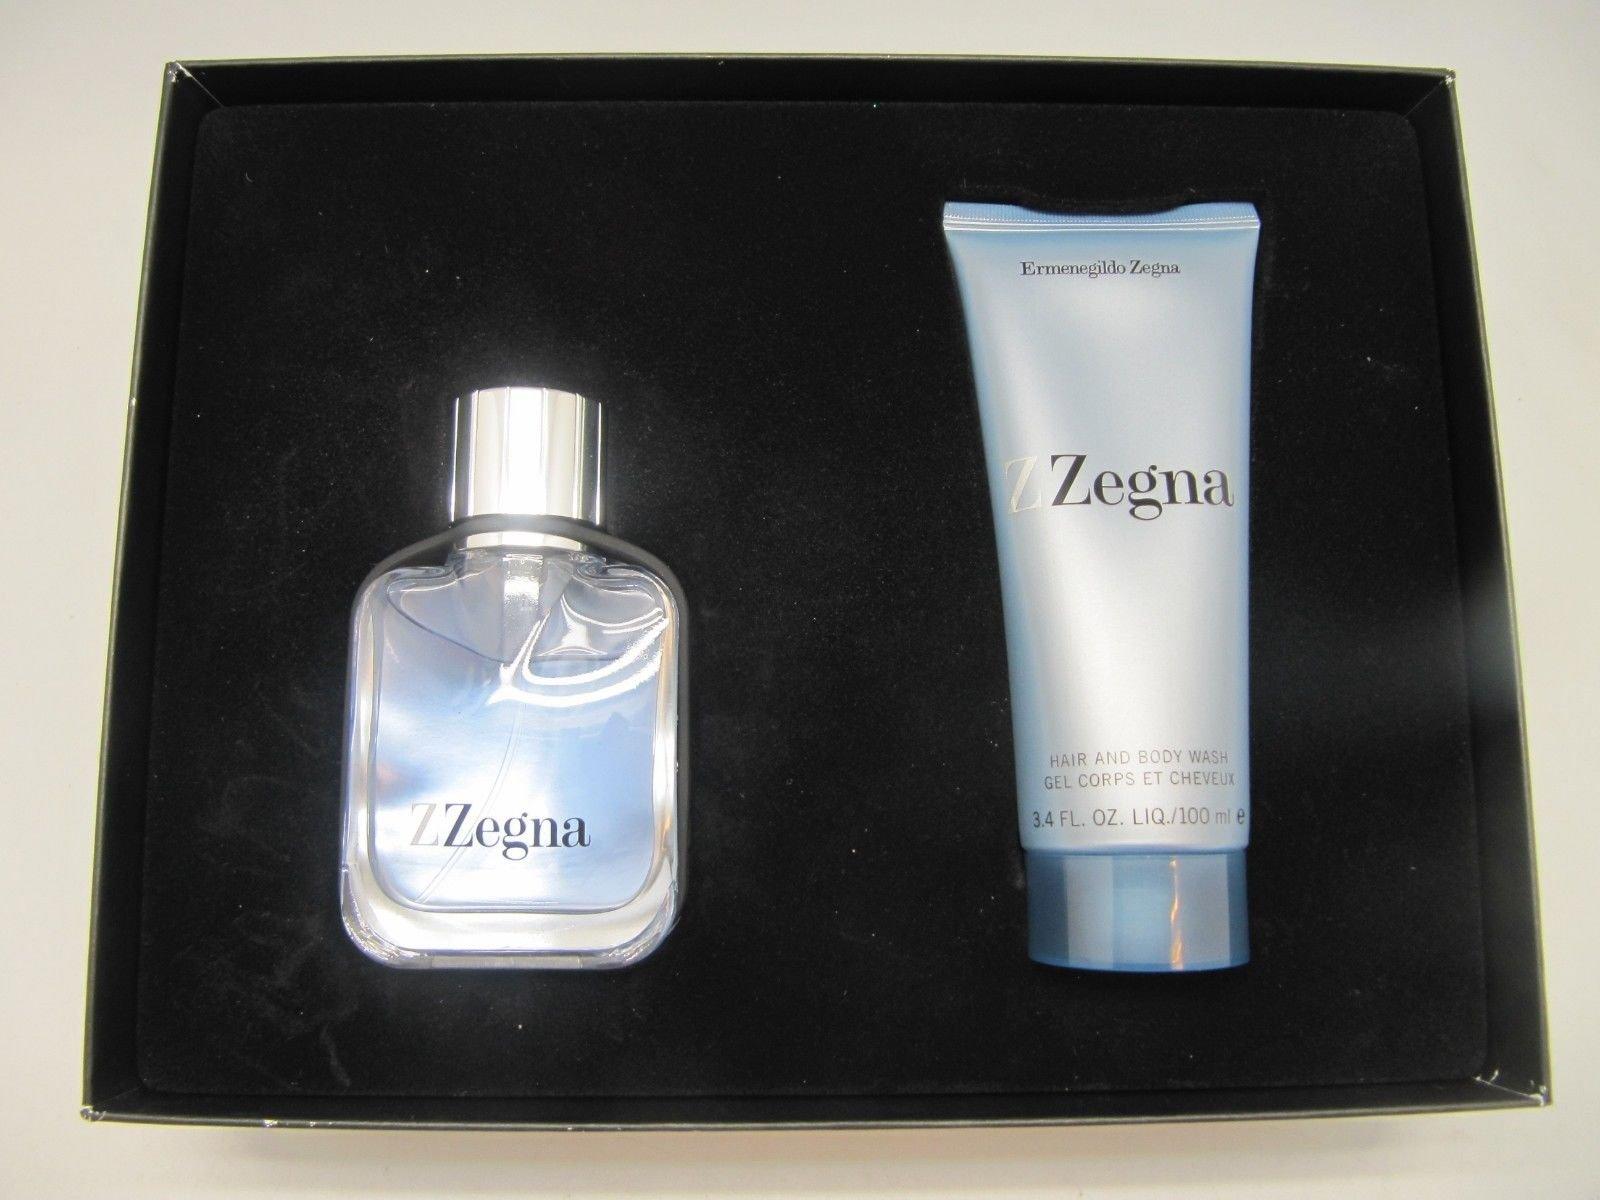 Ermenegildo Zegna 2 Piece Eau de Toilette Spray Gift Set for Men